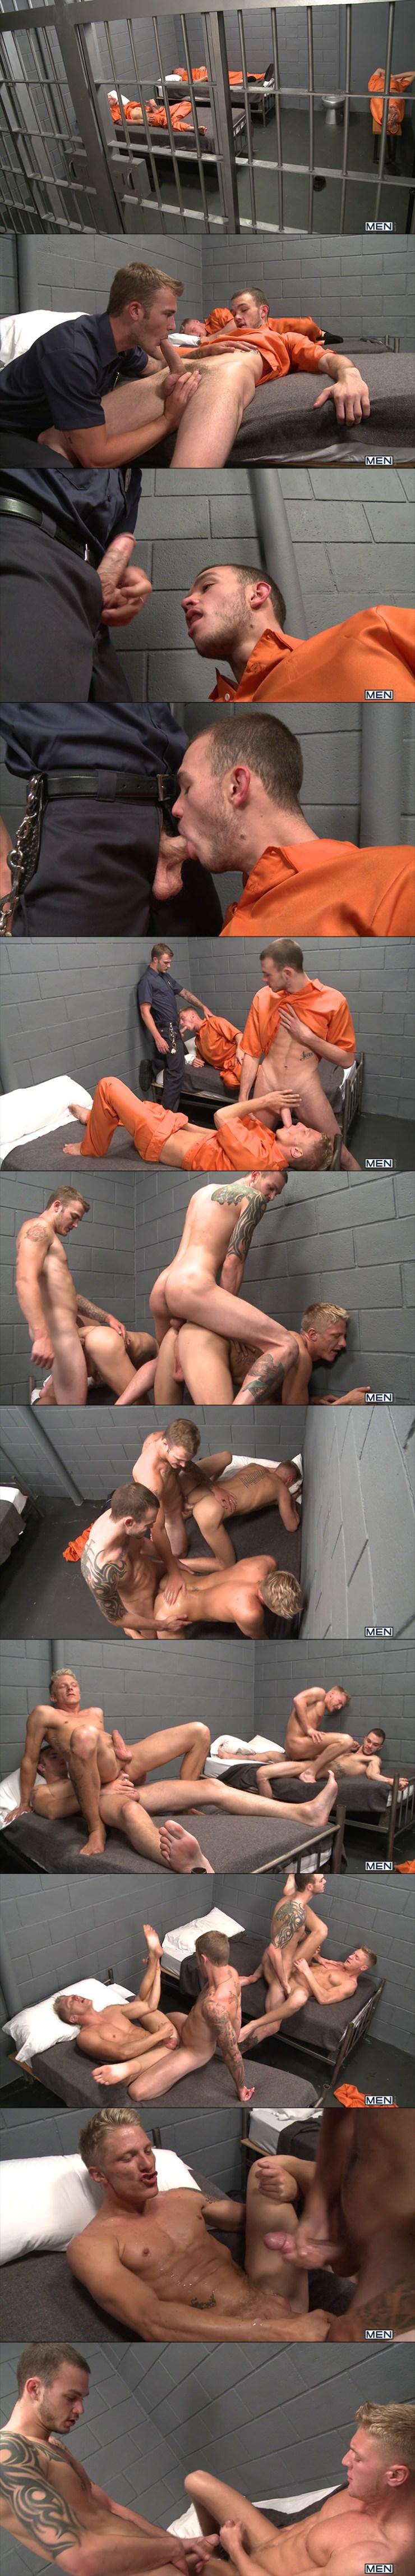 men-drill-my-hole-the-slammer-phillip-aubrey-gavin-waters-cliff-jensen-christian-wilde-prison-group-sex-tattoos-stills